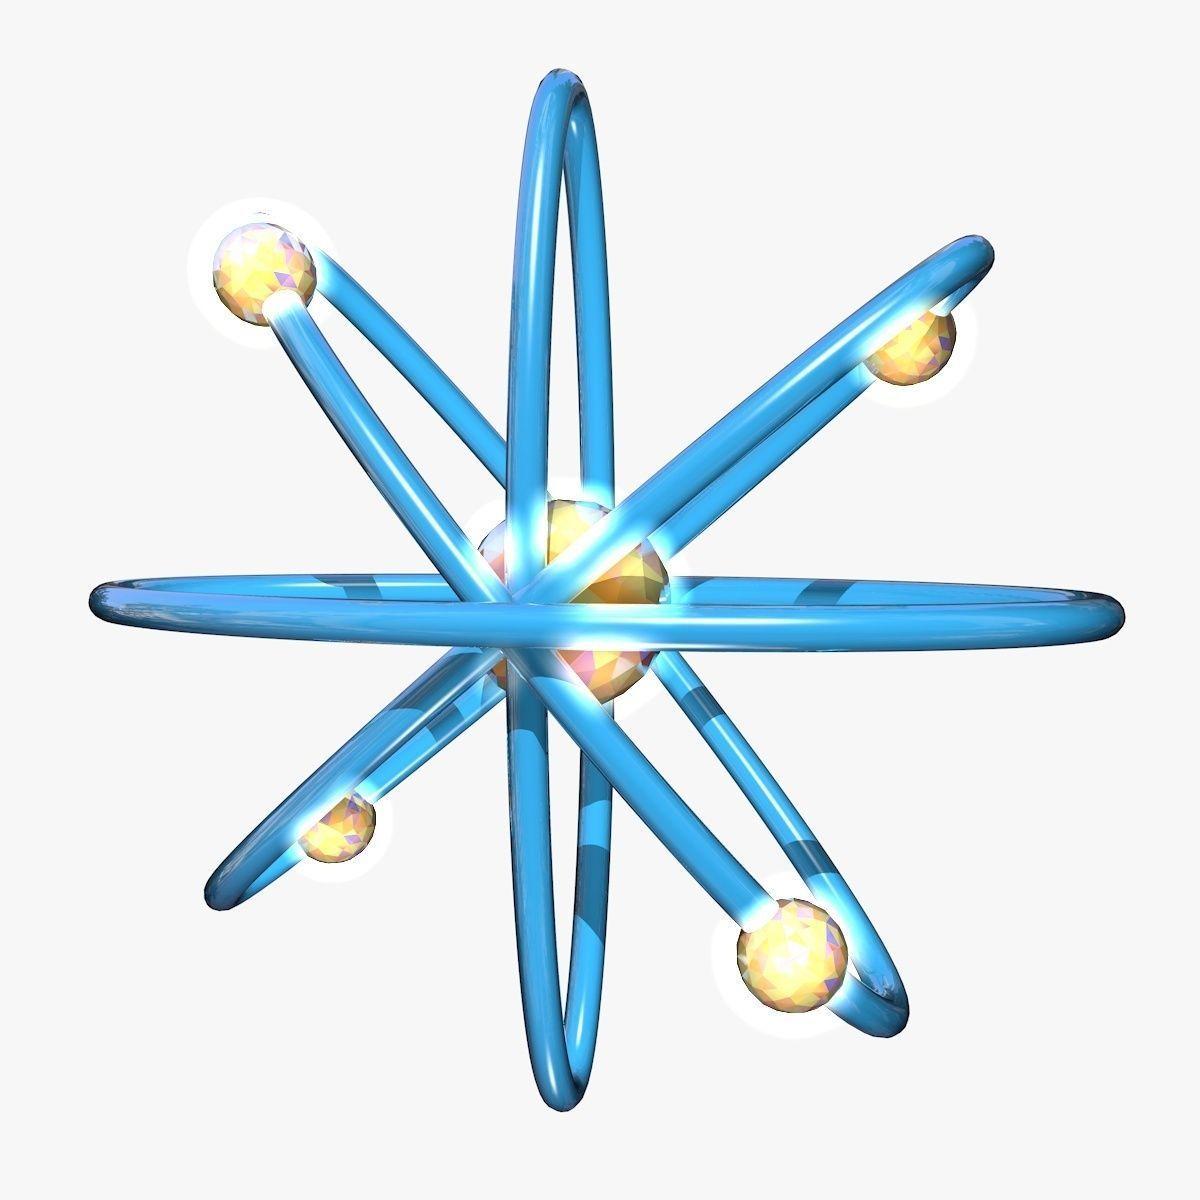 hight resolution of  blue atom model 3d model obj mtl 3ds fbx c4d dxf stl 2